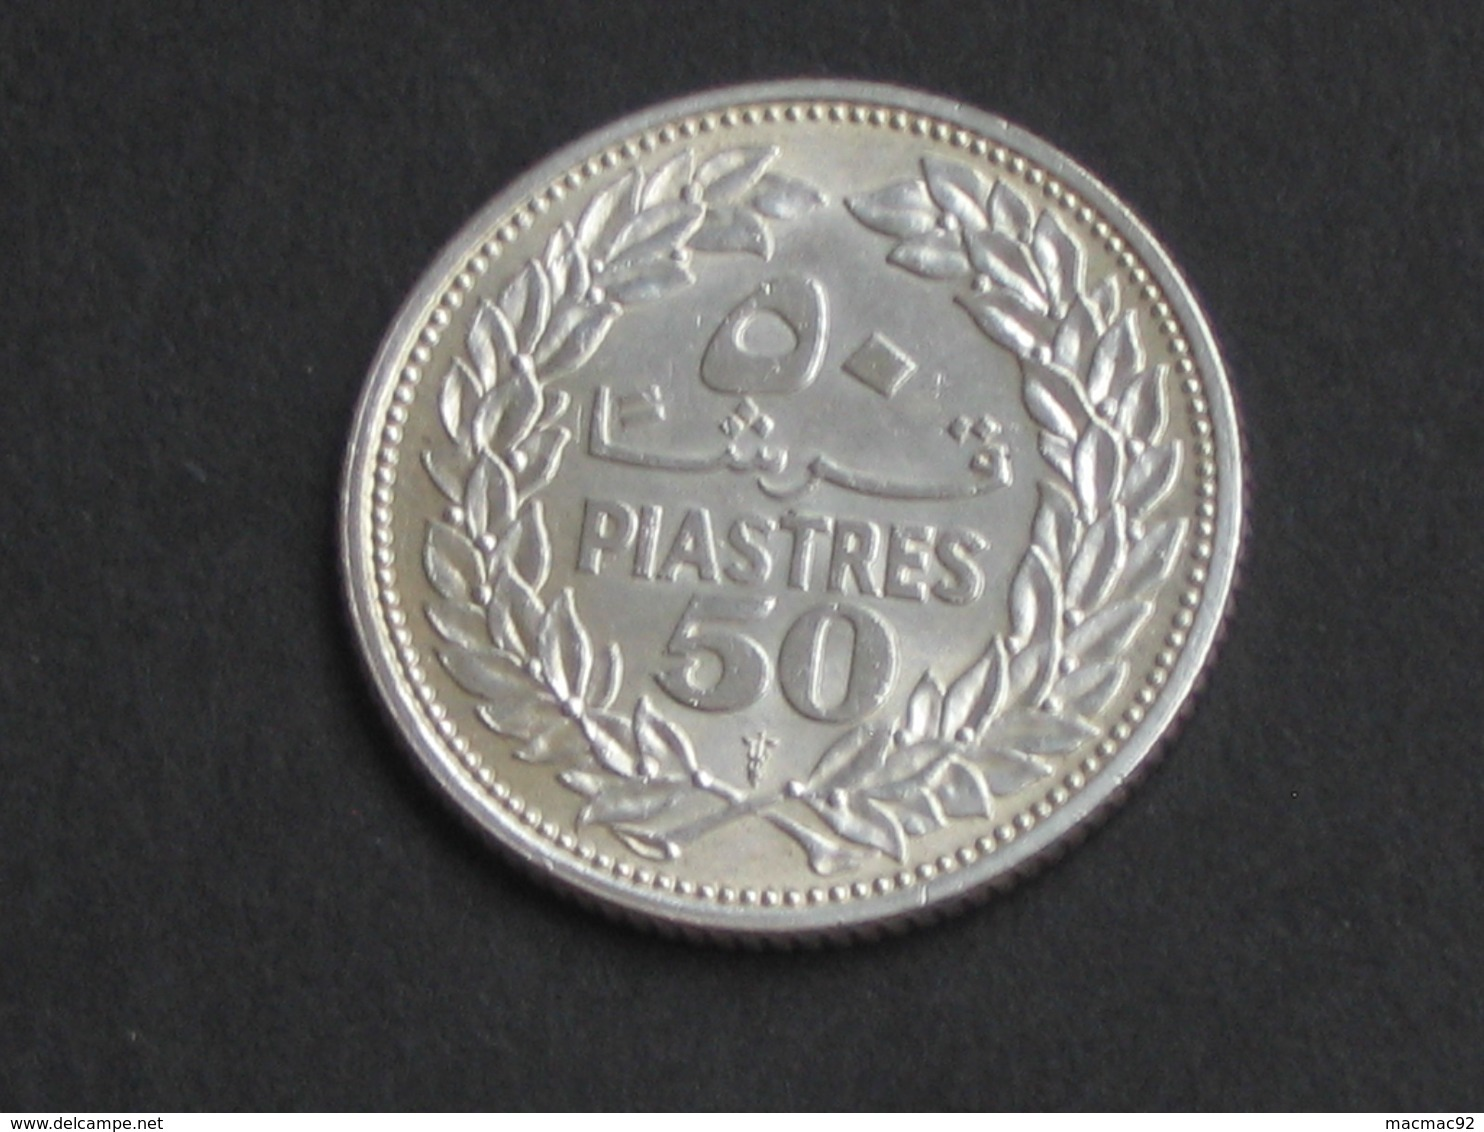 LIBAN - 50 Piastres 1952 - Argent - Silver  **** EN ACHAT IMMEDIAT **** Monnaie Quasi SPL !!!!! - Liban